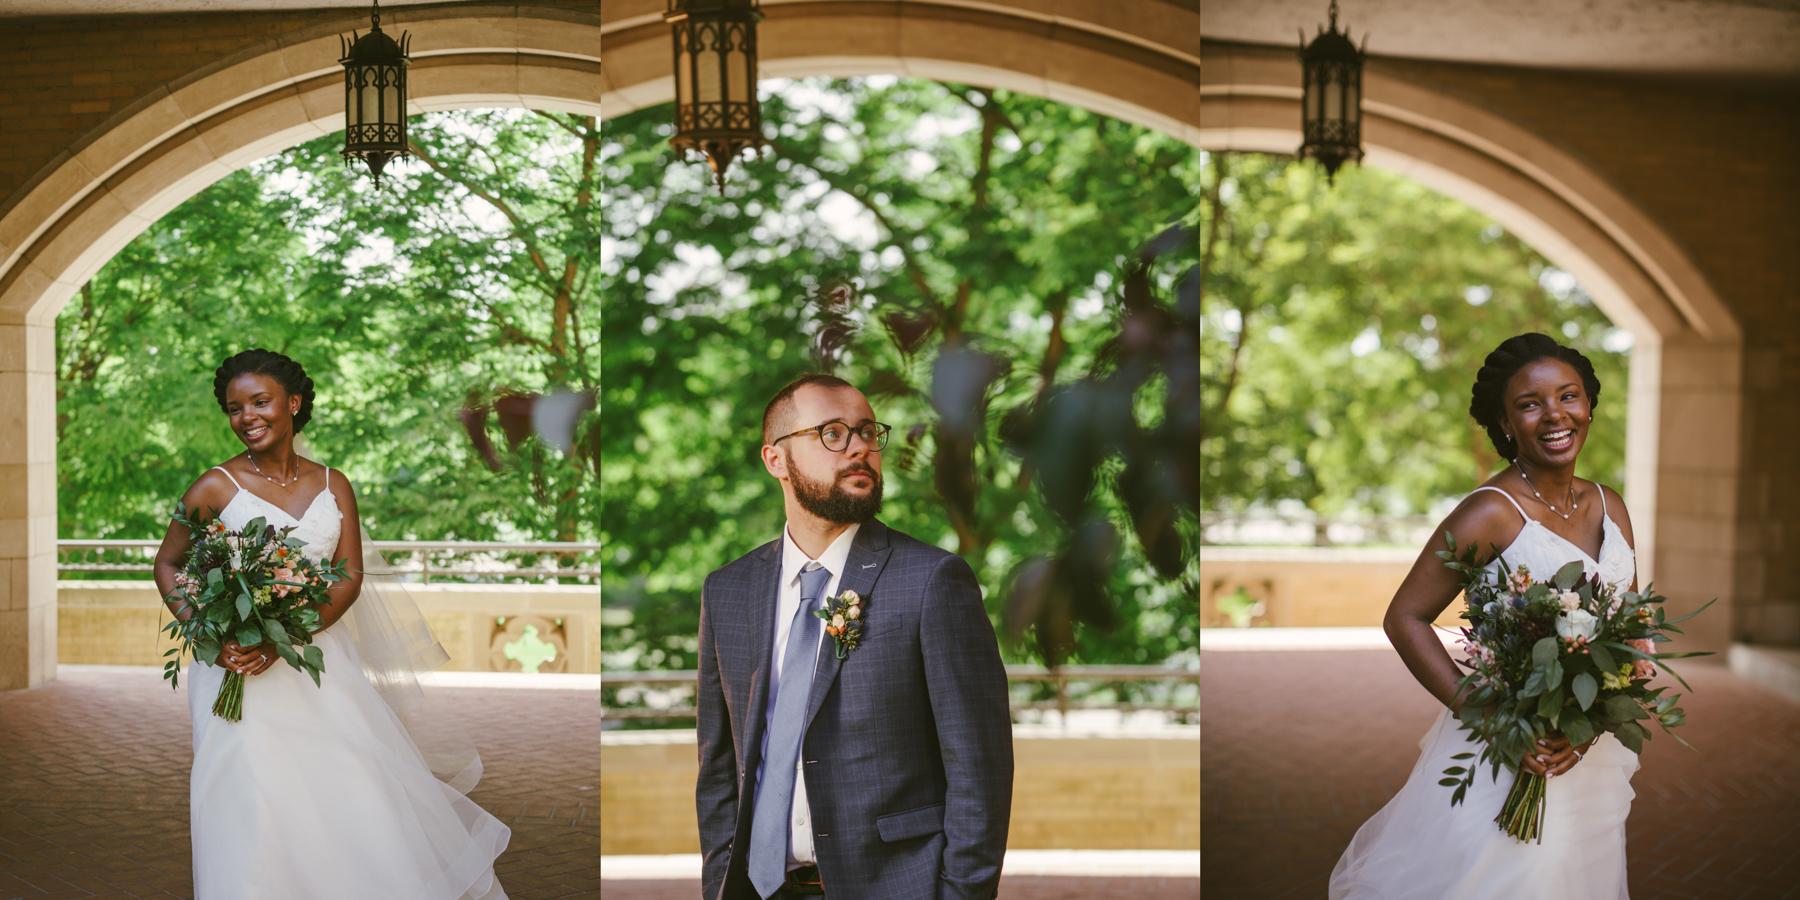 038 may-jimmy-notre-dame-wedding.jpg